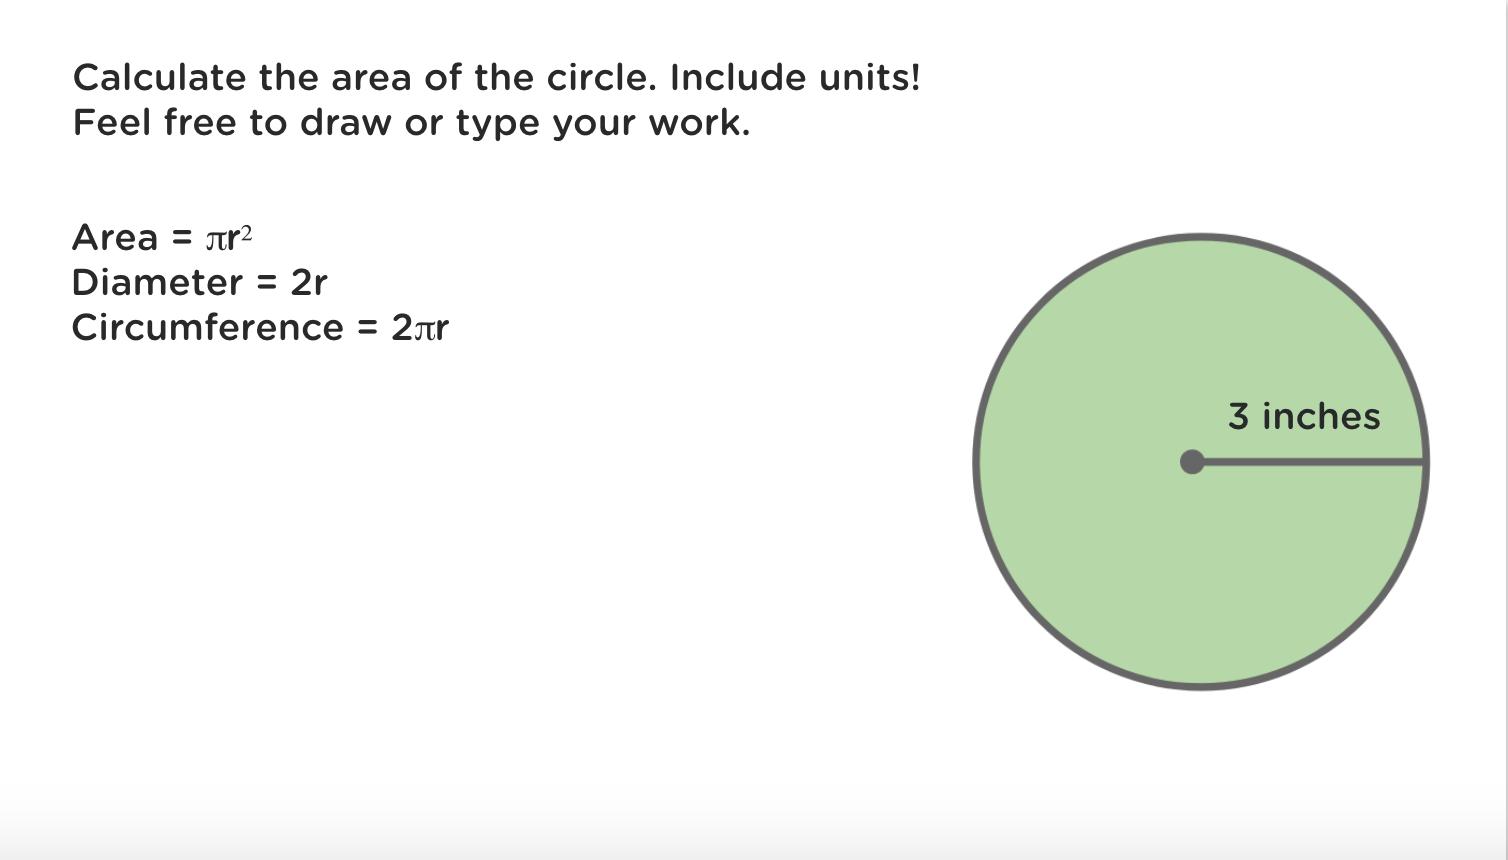 hight resolution of A Classkick Assignment: 7th Grade Math — Area of Circles   by Classkick  Blog   Classkick